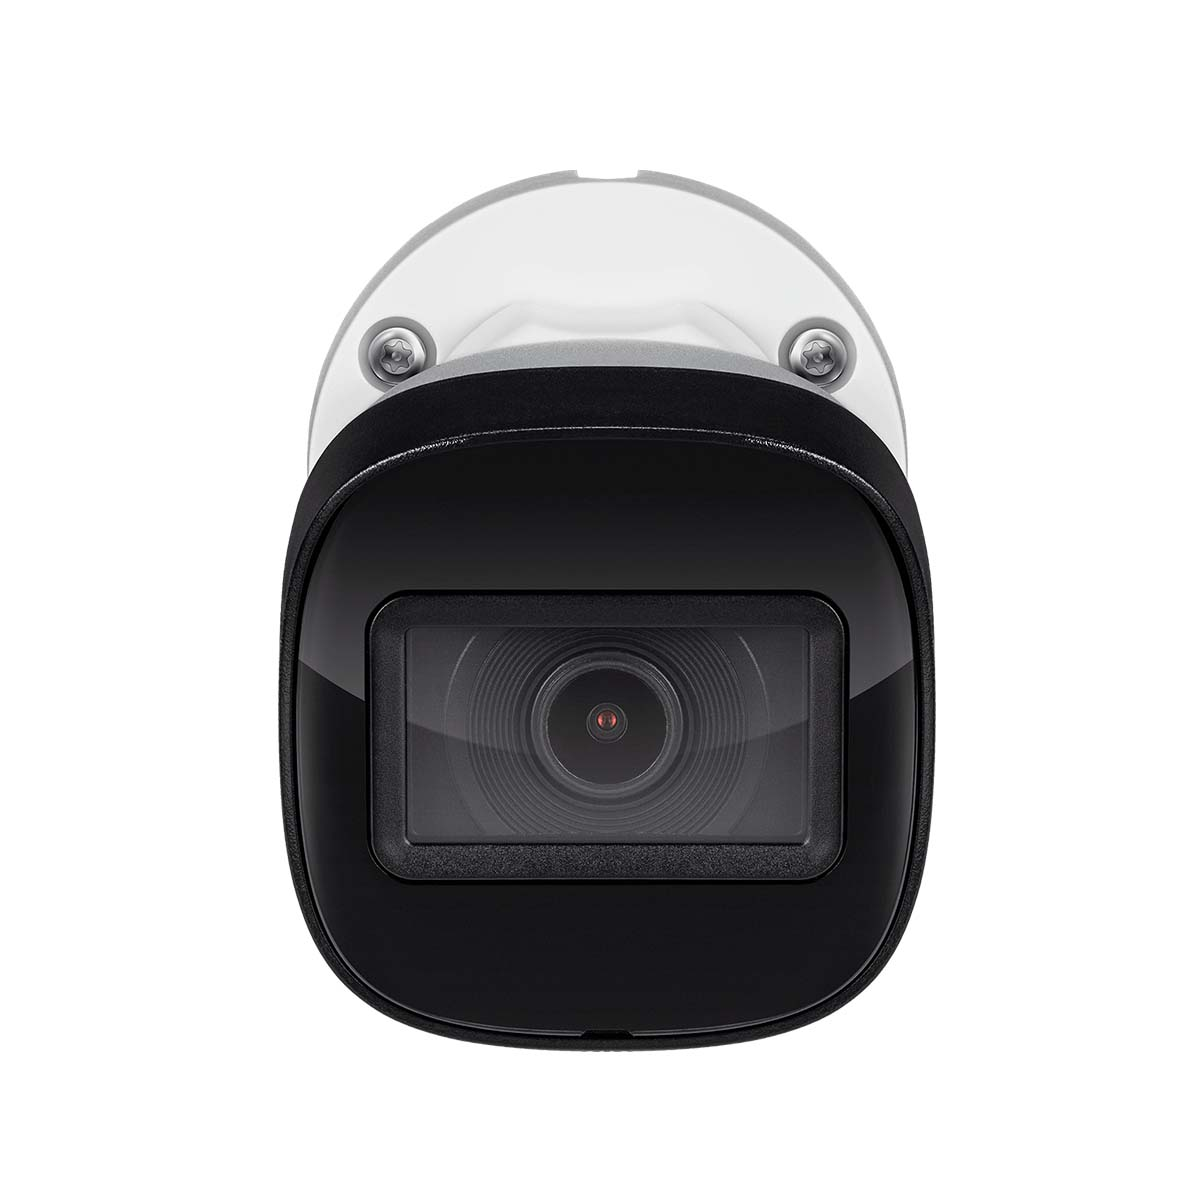 Kit 09 Câmera Bullet Intelbras Vhd 1120 B G6 720p 2.8mm